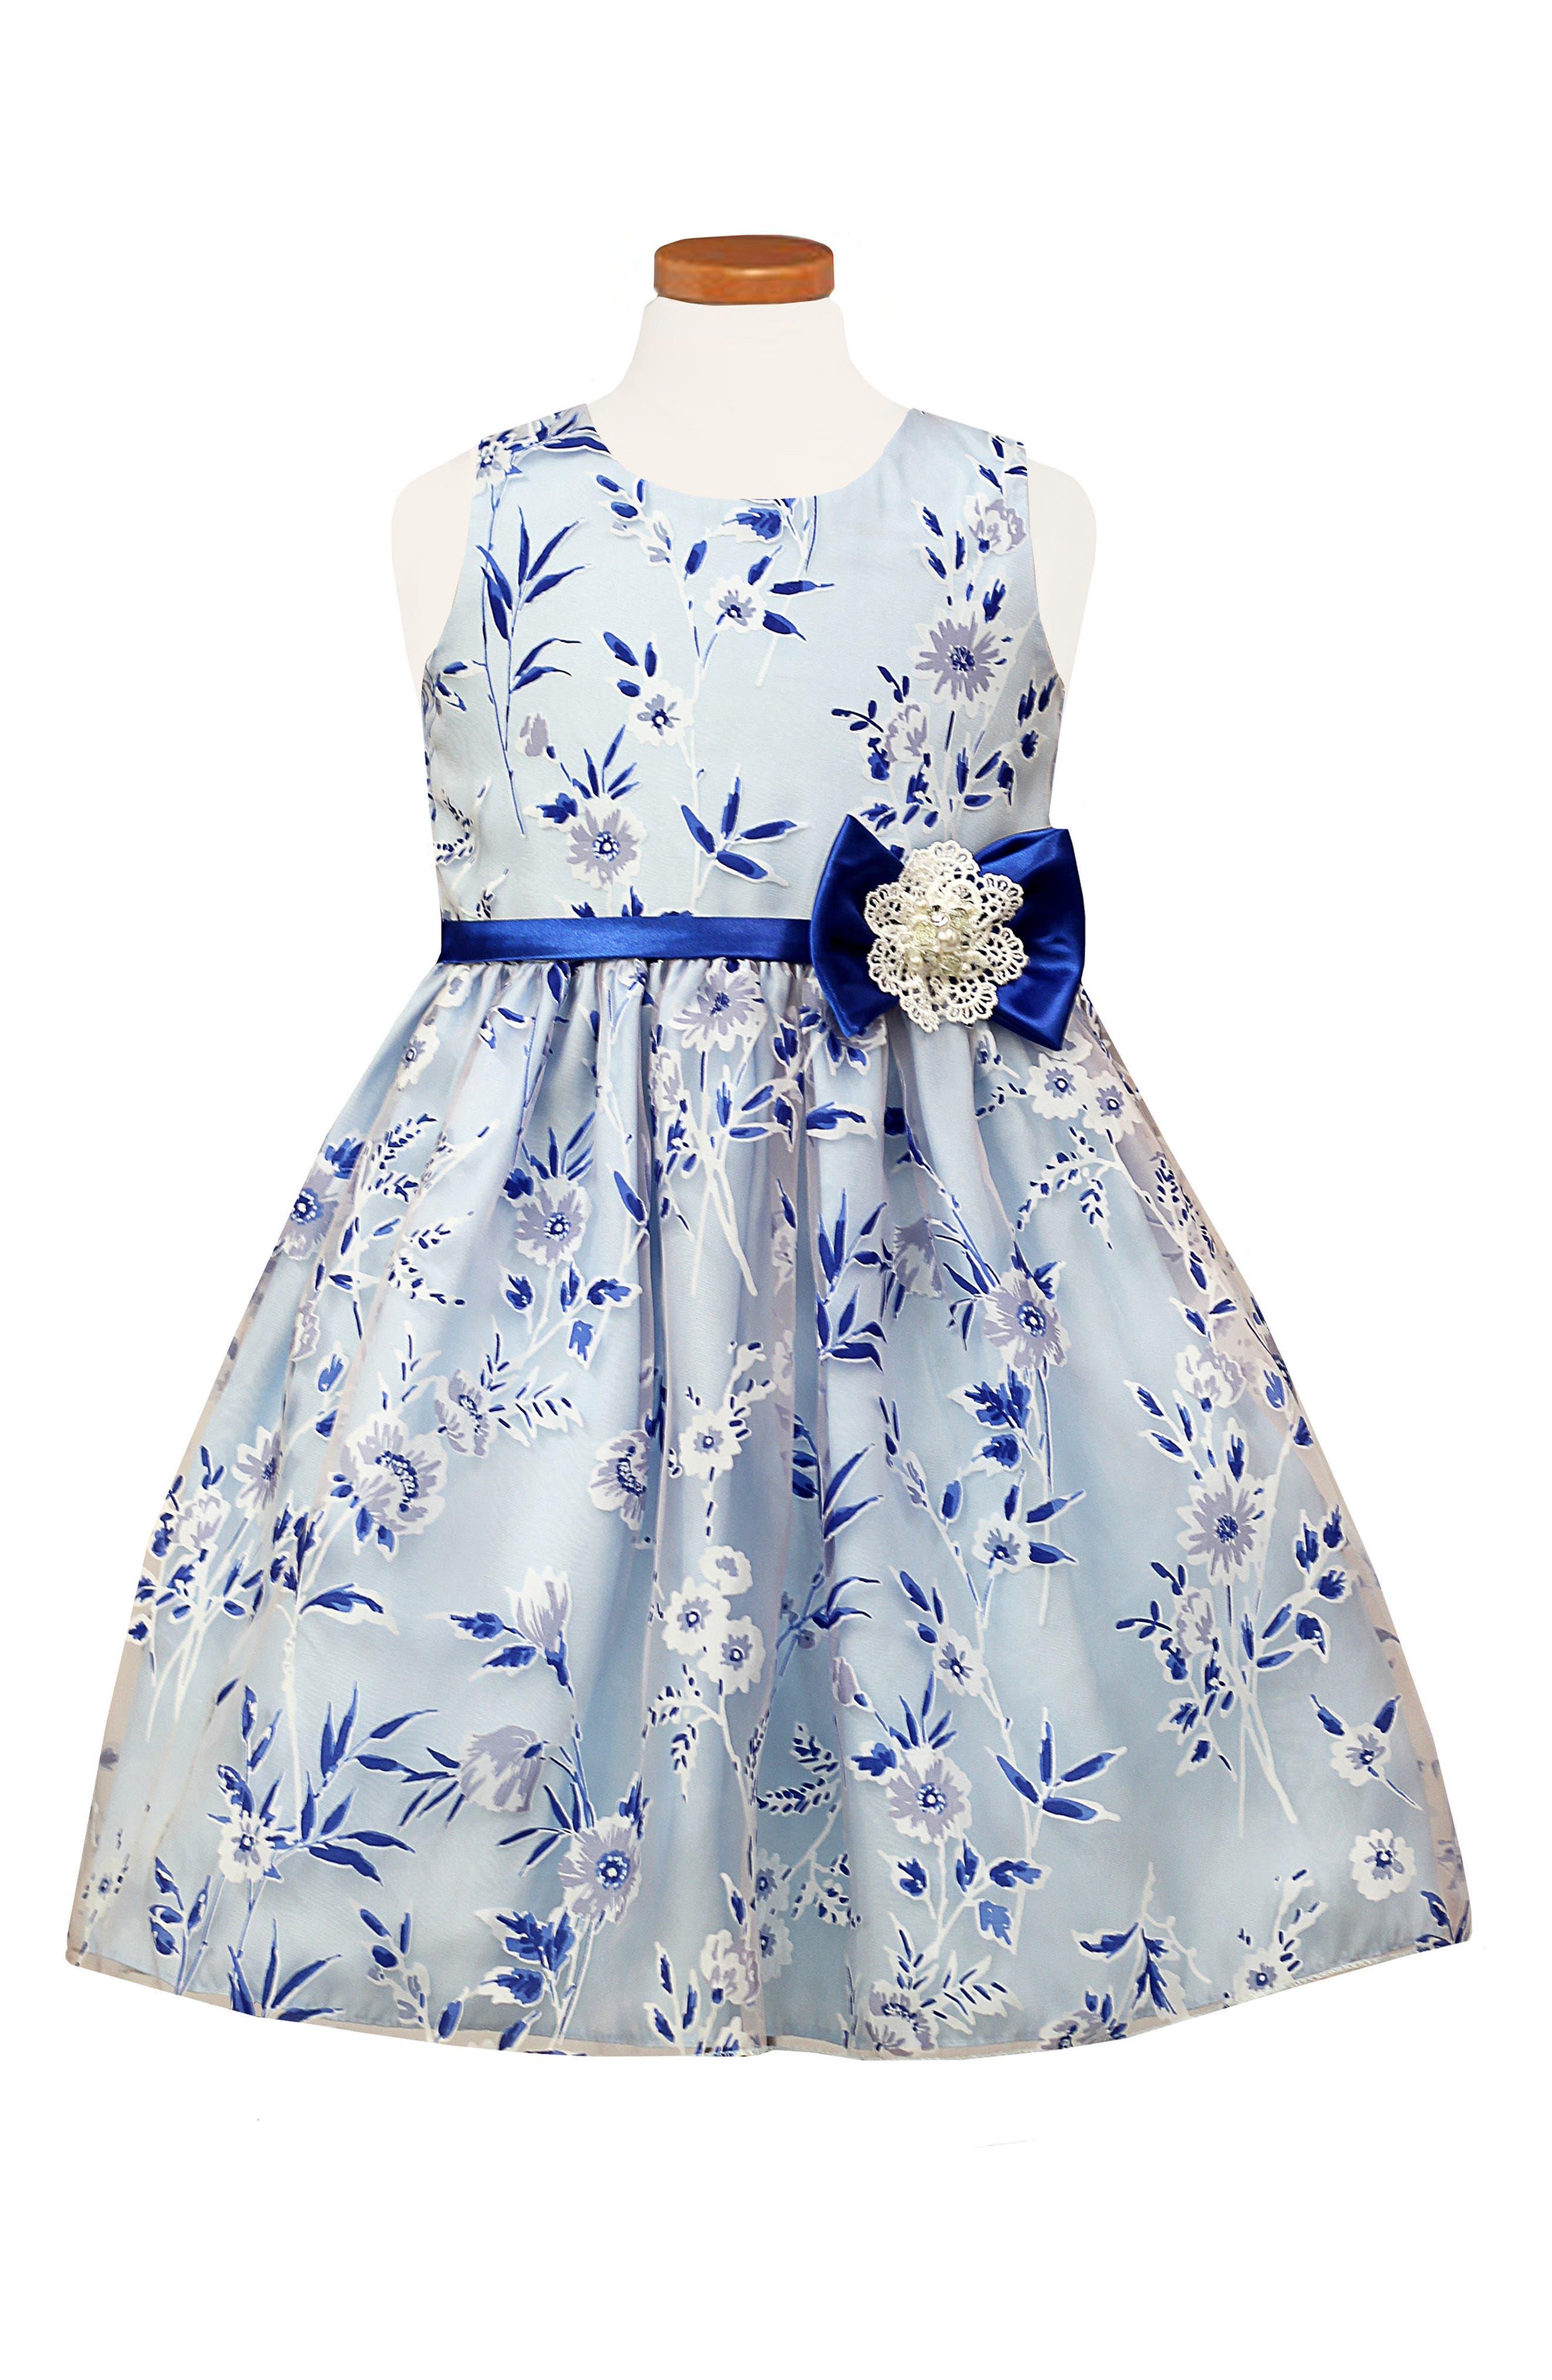 Floral Sleeveless Dress,                         Main,                         color, BLUE